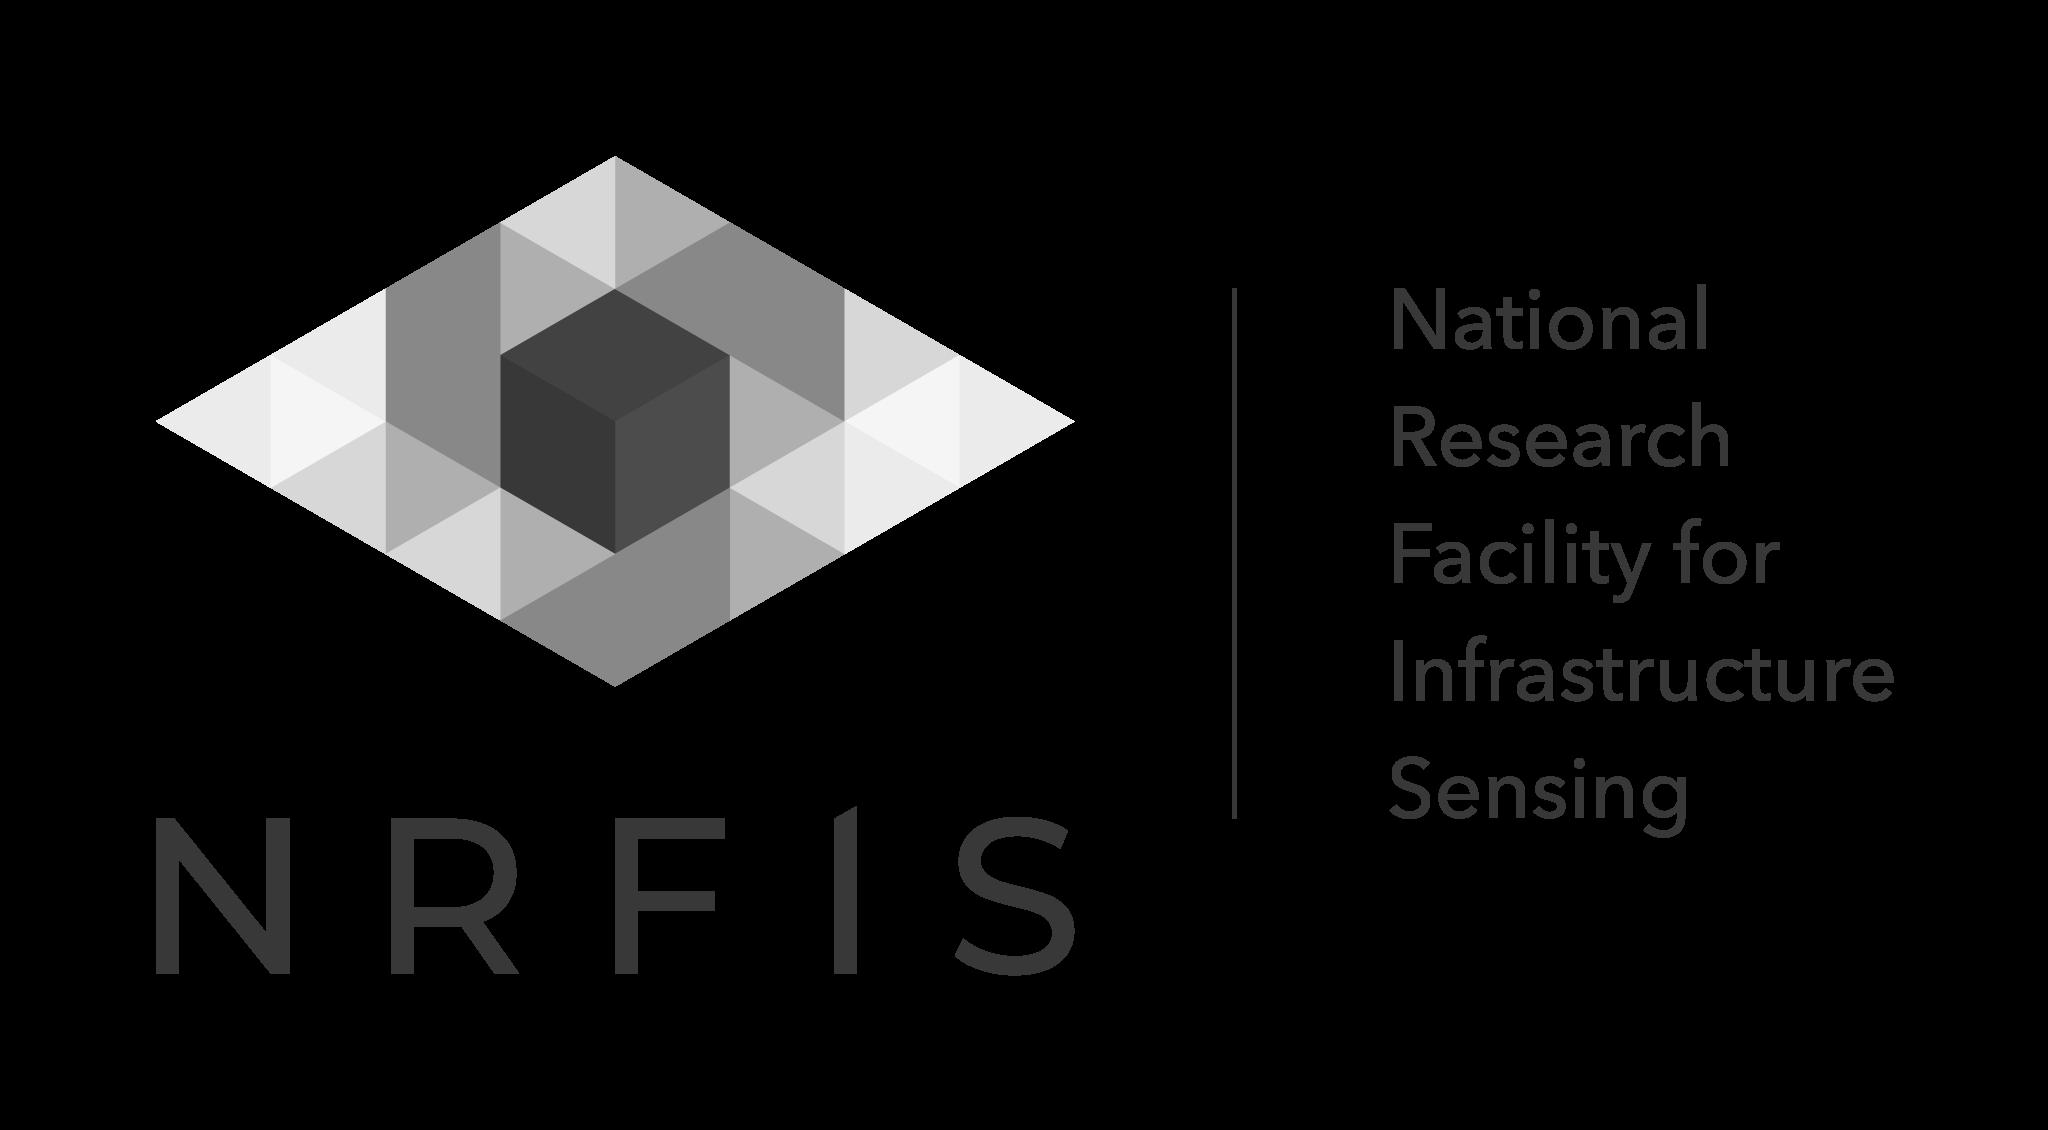 NRFIS logo